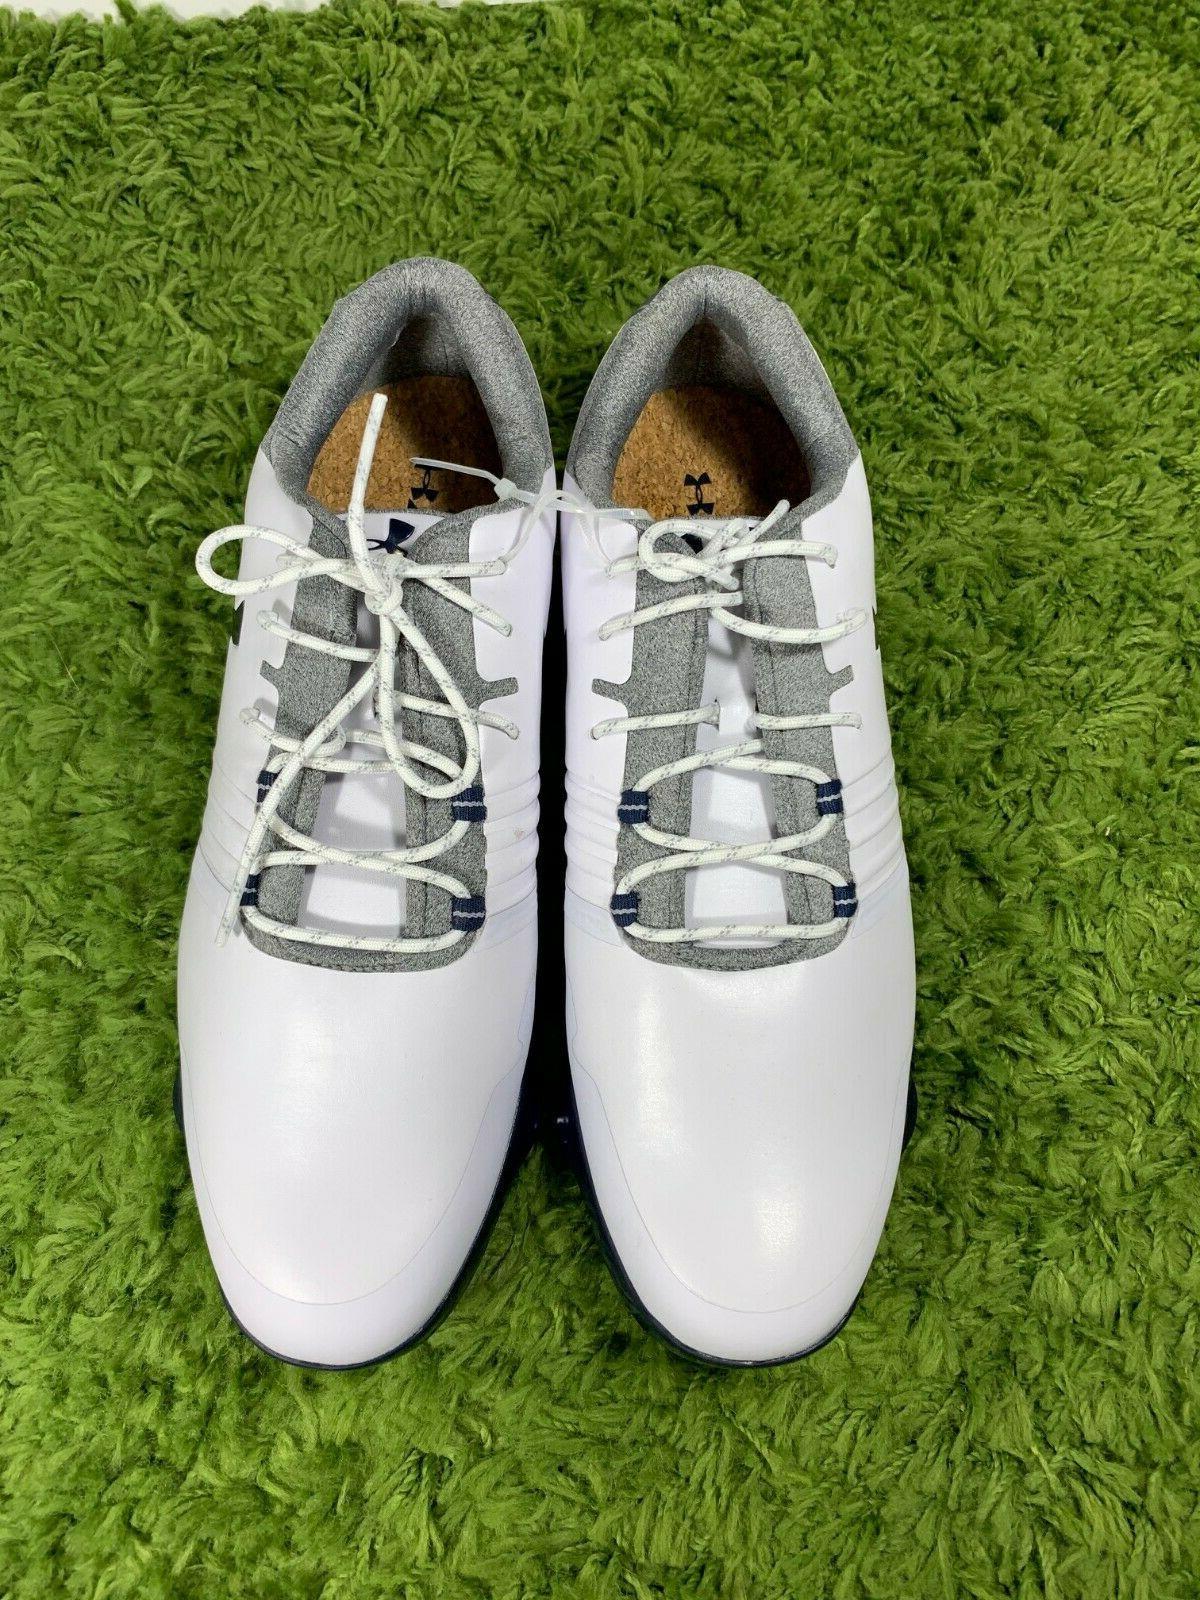 Under Spieth Match Size 10 Navy Blue Shoes